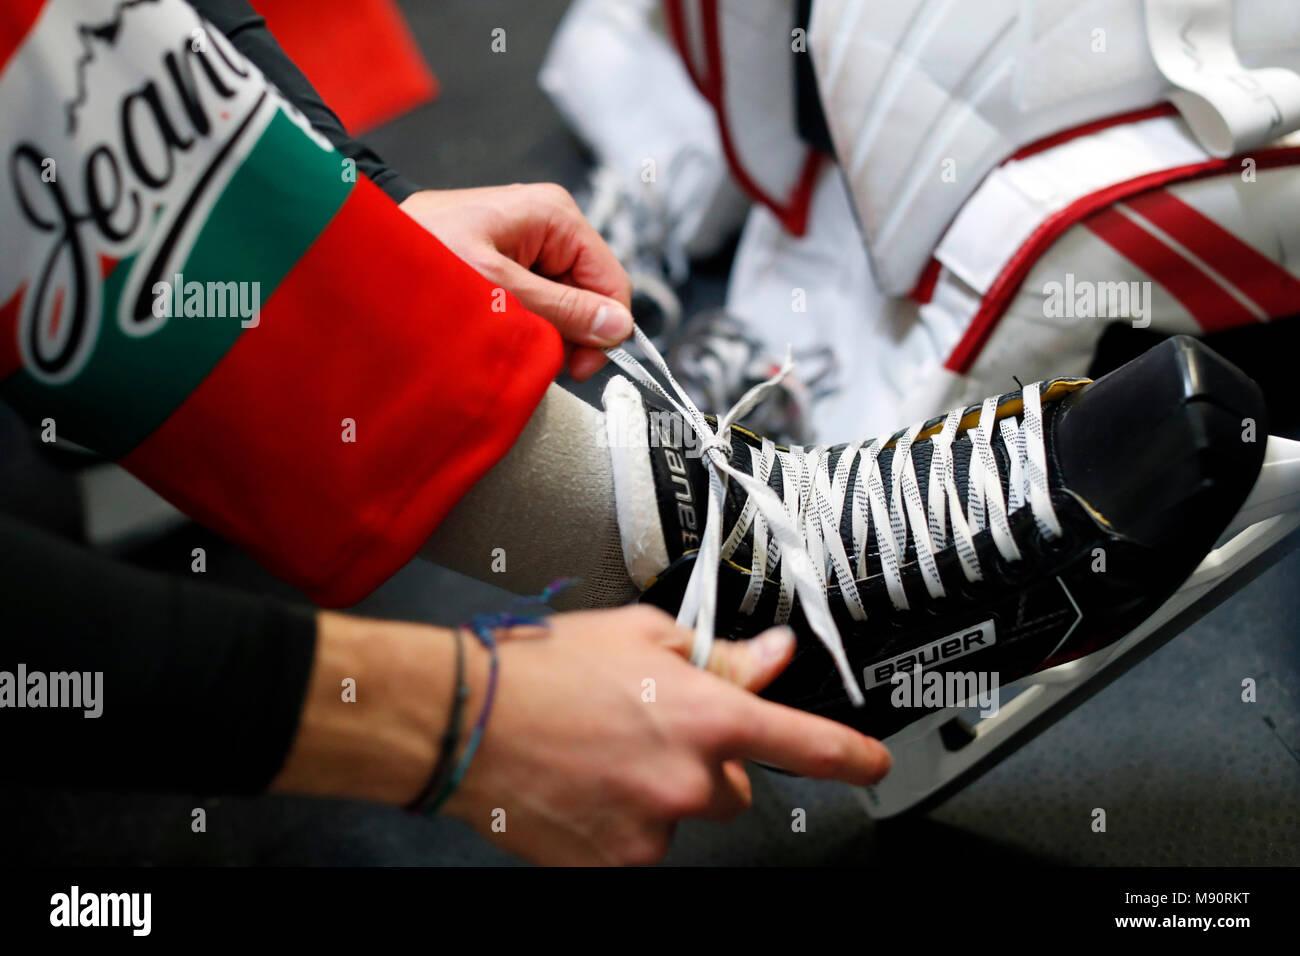 Ice Hockey. Locker room. Ice skate. - Stock Image